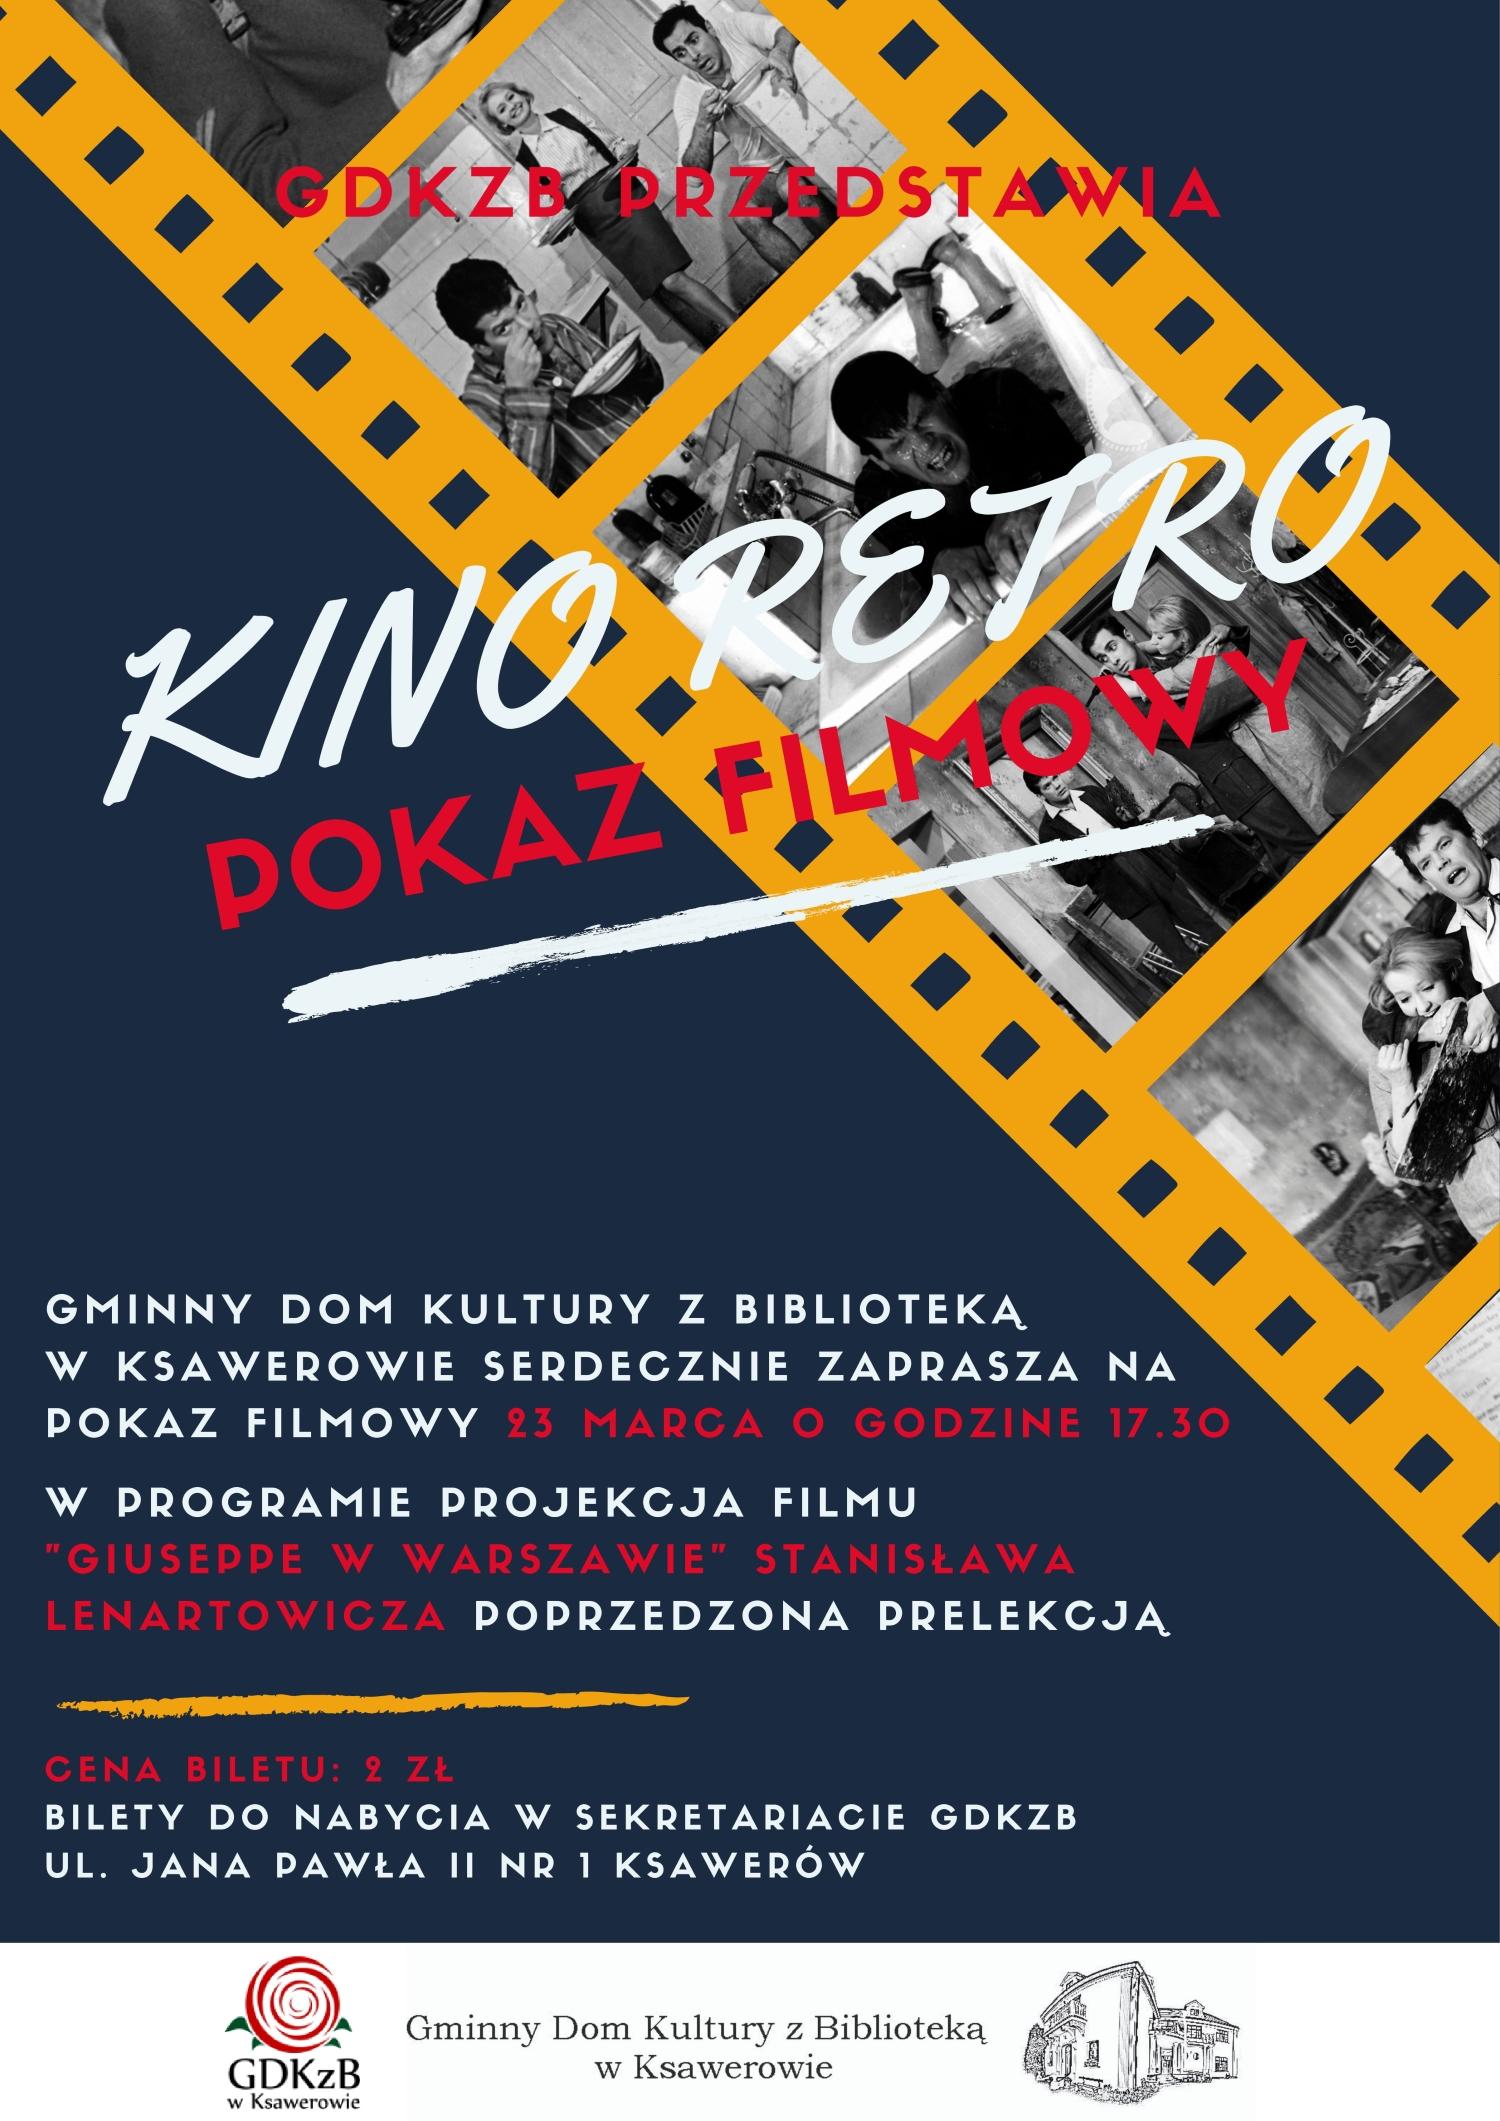 Kino retro zaproszenie